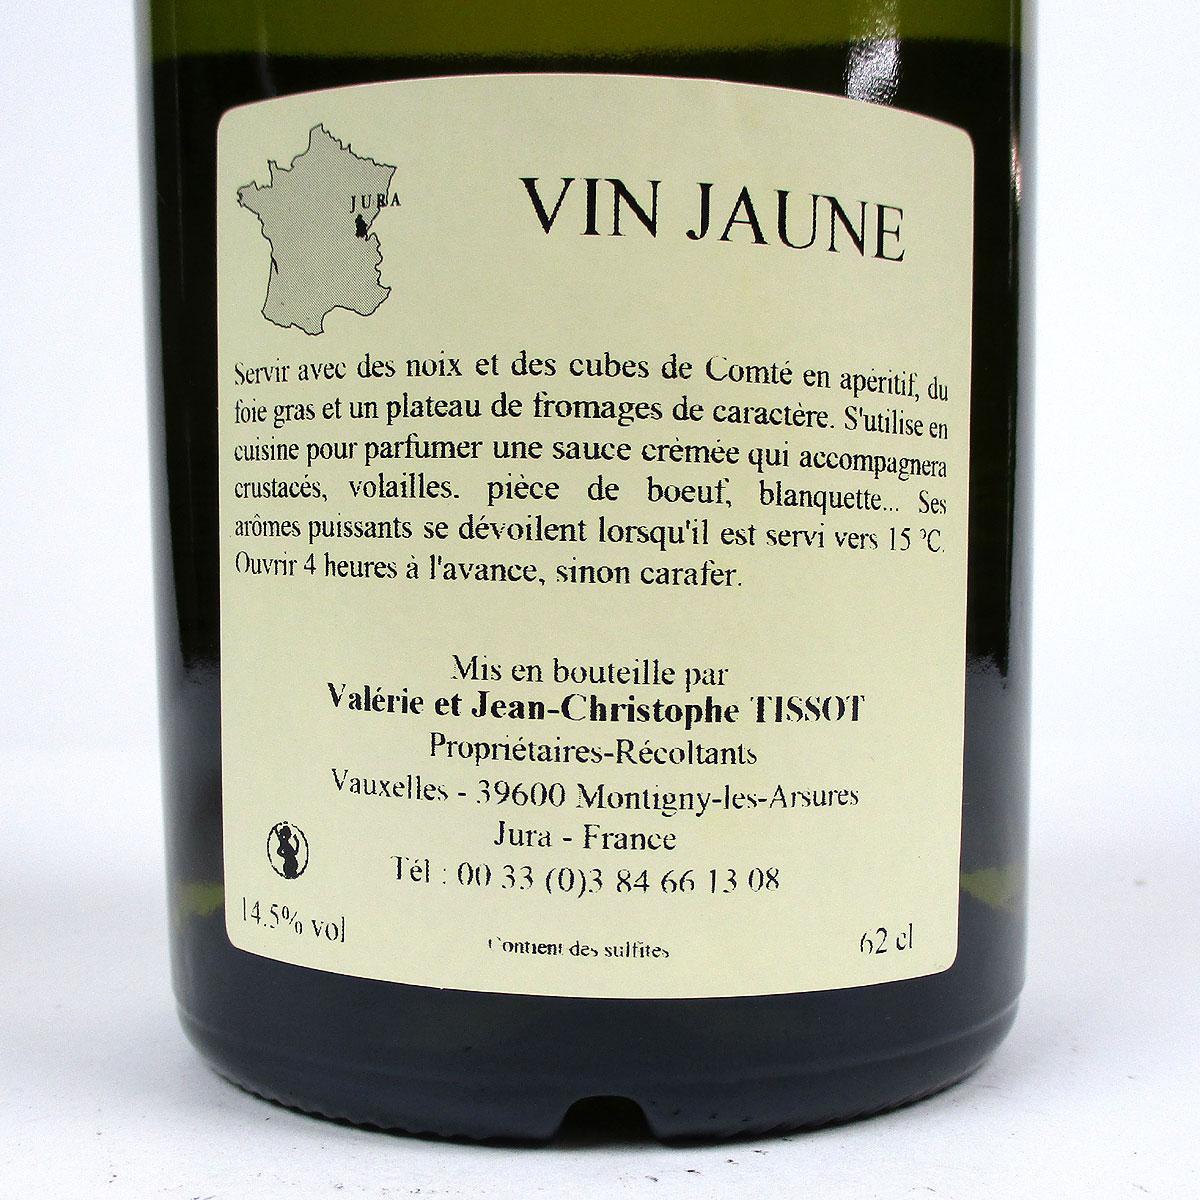 Jura Arbois: Vin Jaune Domaine Jean-Louis Tissot 2014 - Bottle Rear Label